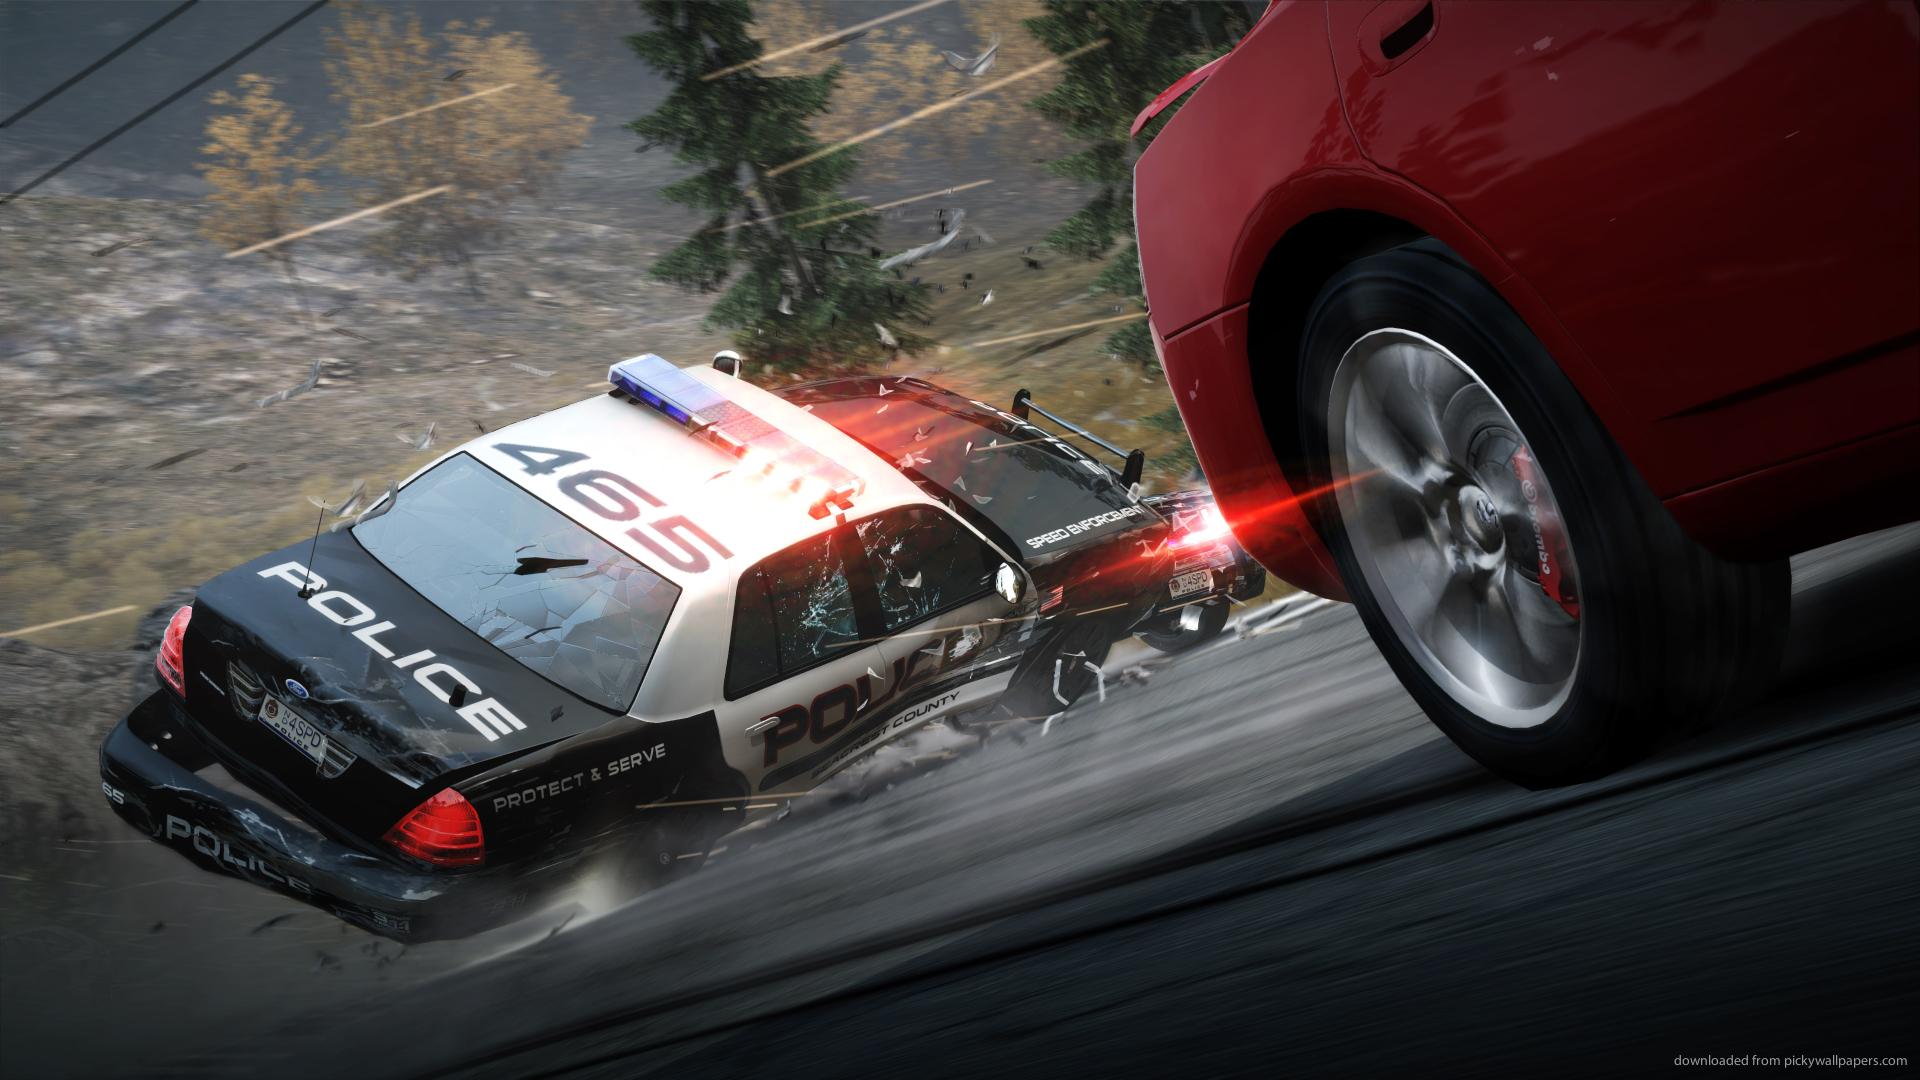 Cool screensavers Police screensaver 1920x1080